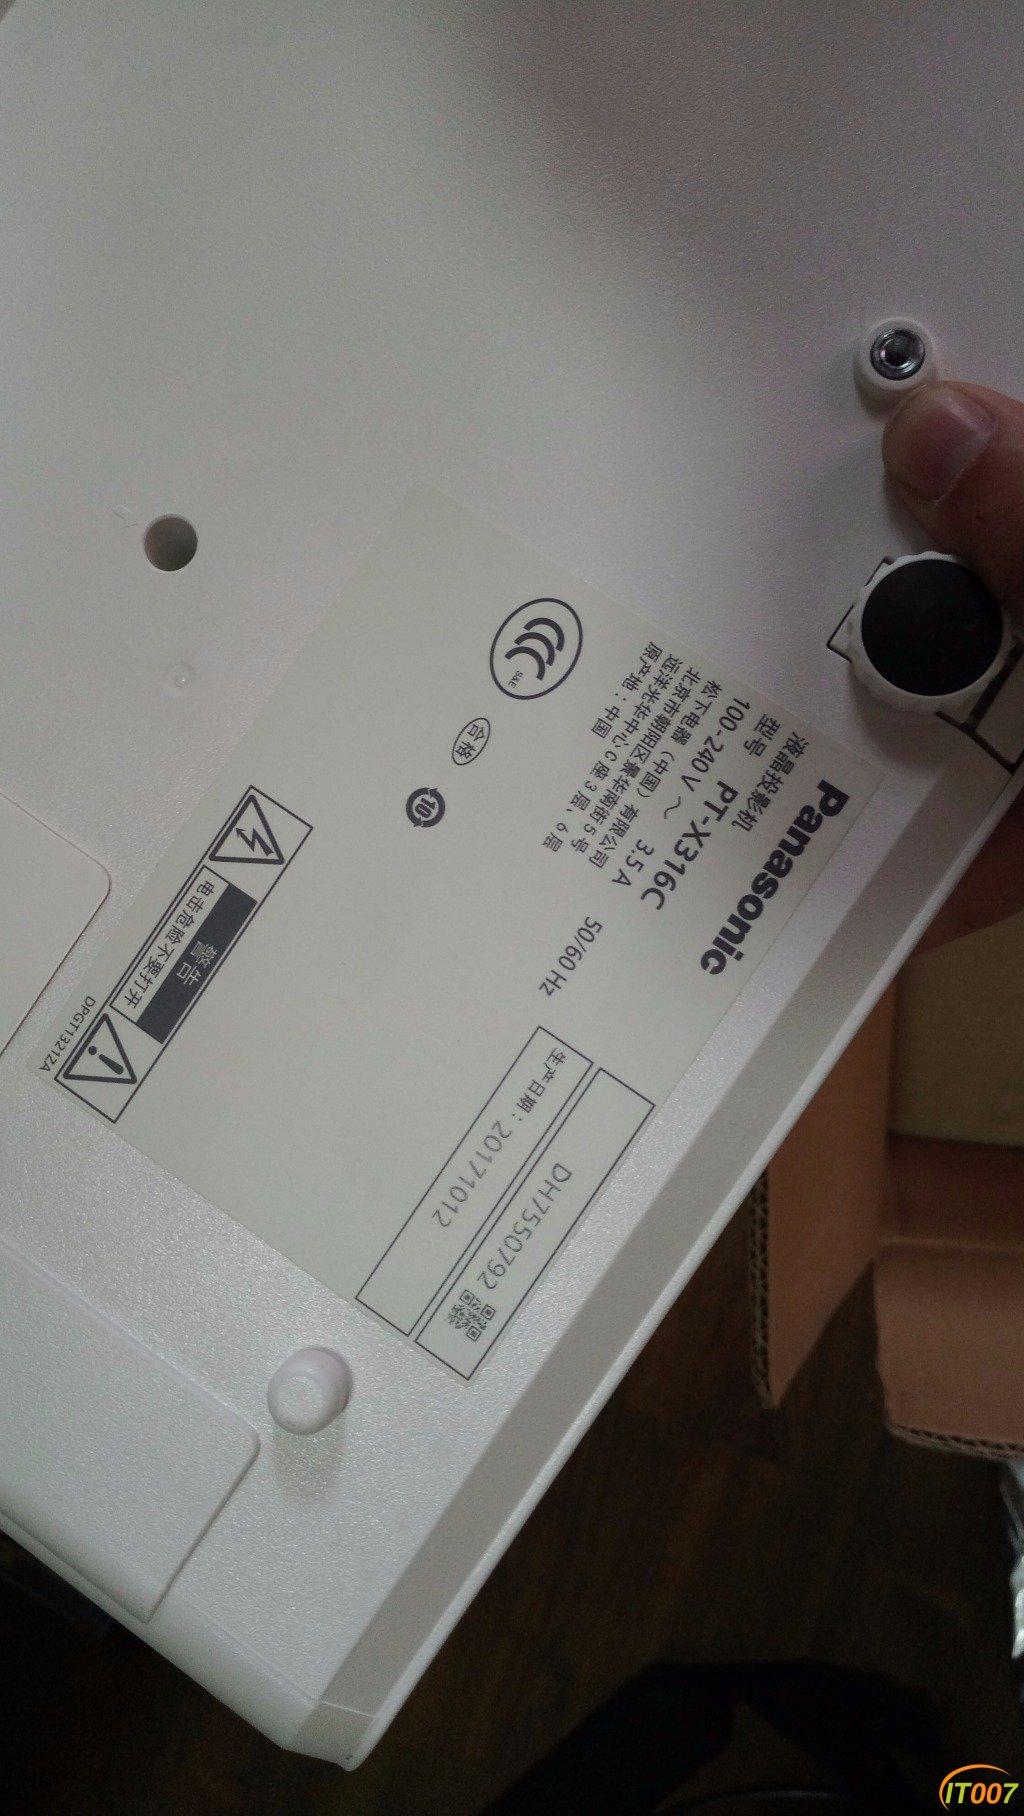 P71207-135410.jpg